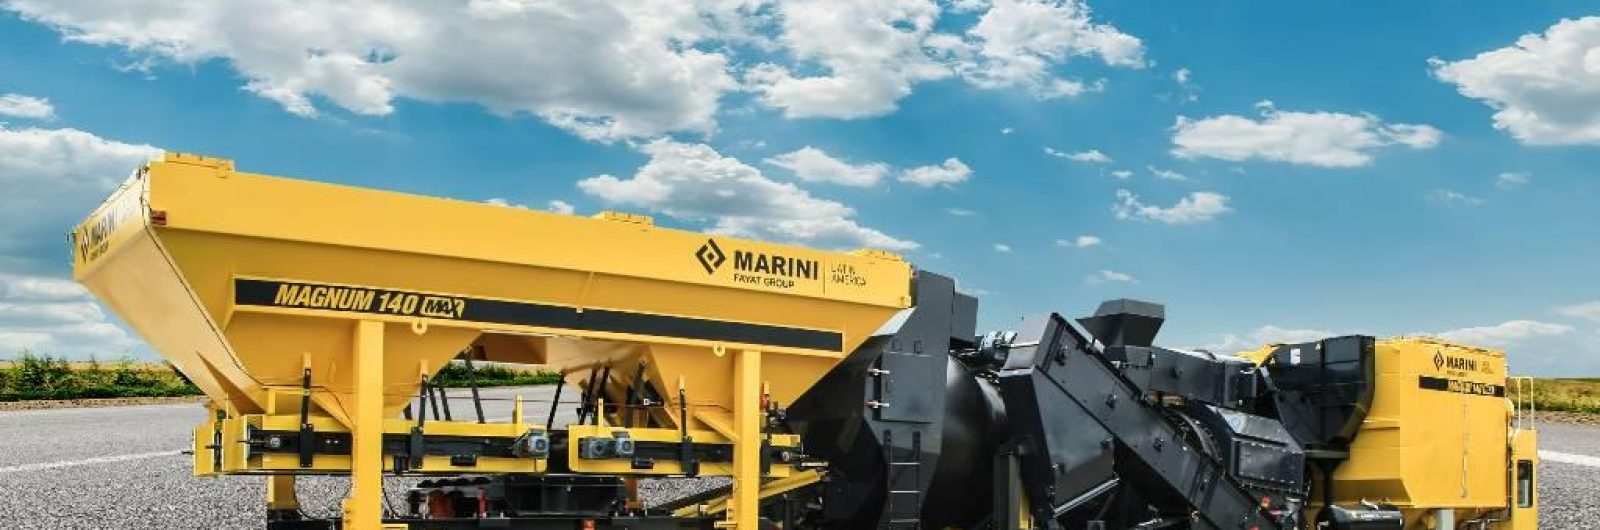 marini-magnum-140-mobile-aspha,13450ef2